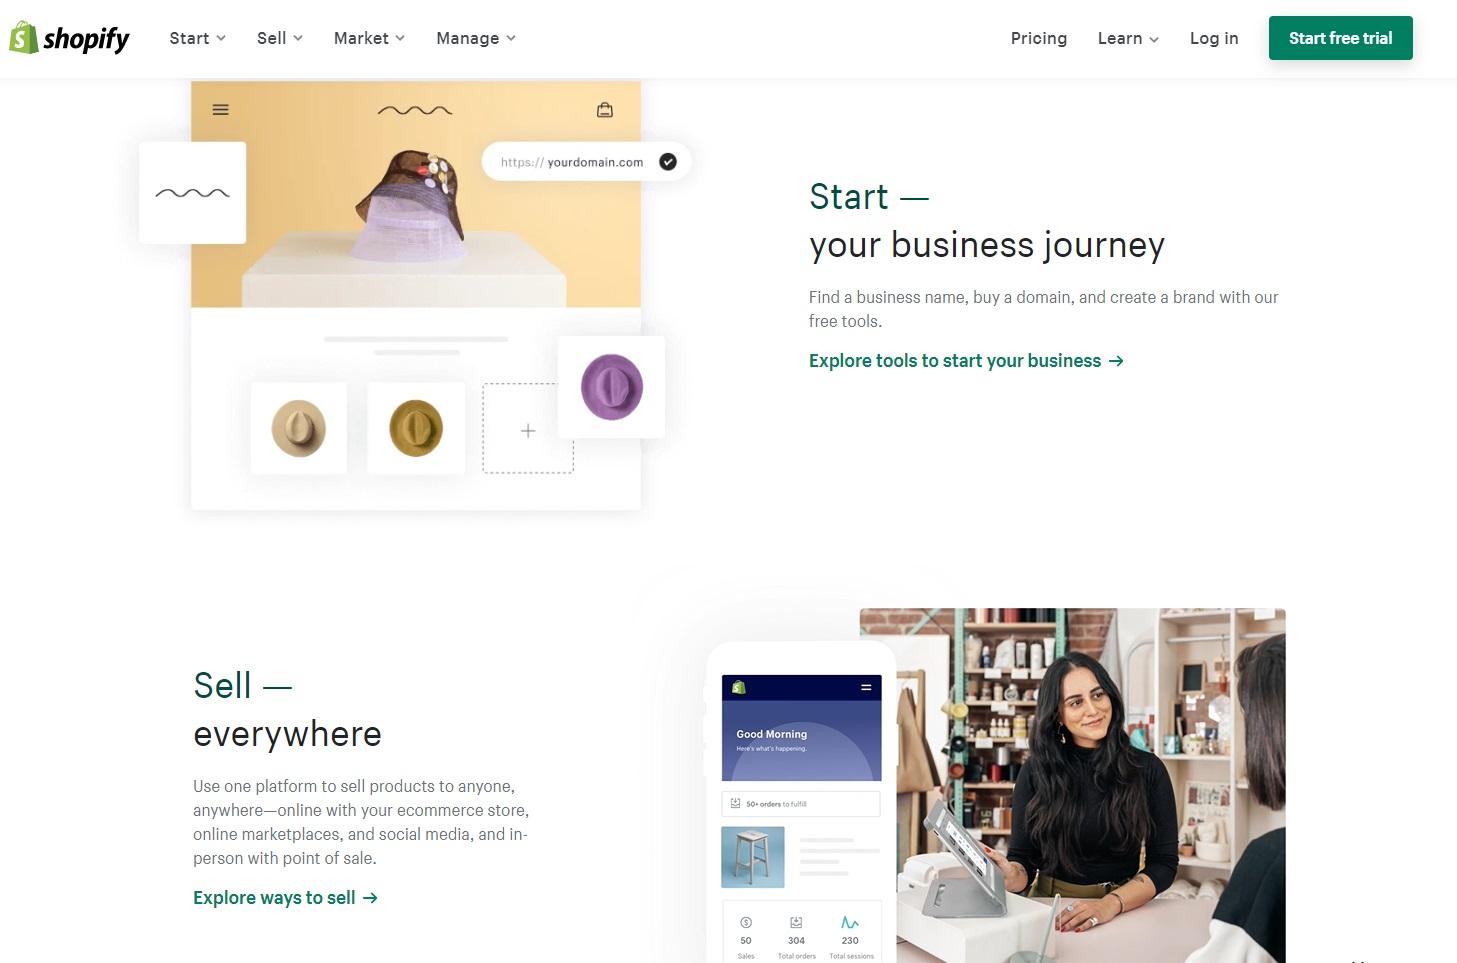 【Amazon開店?】認識自家網店和網上商城的不同之處!- Shopify